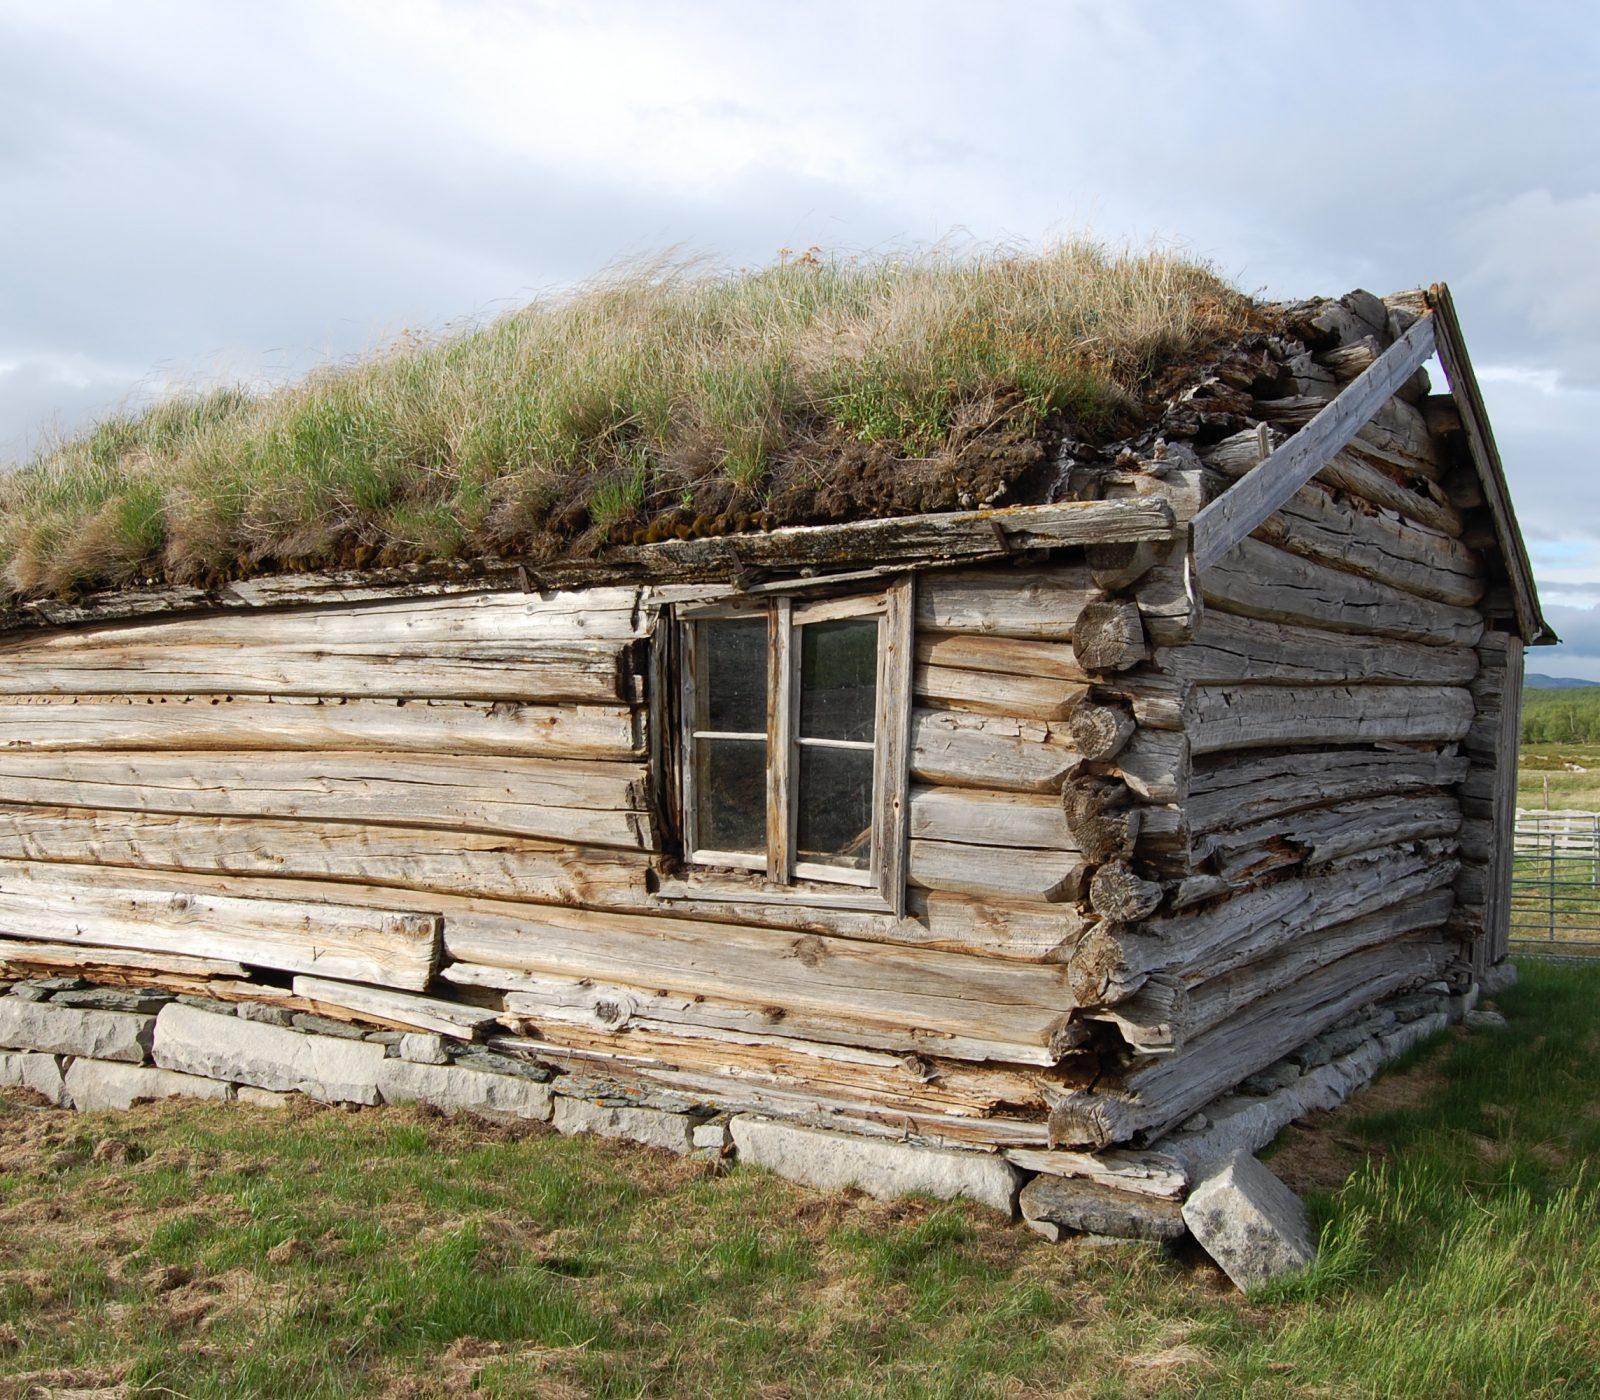 Karstugu på Fokstugu fjellstue før istandsetting. (Foto: Einar Engen/Kulturminnefondet)